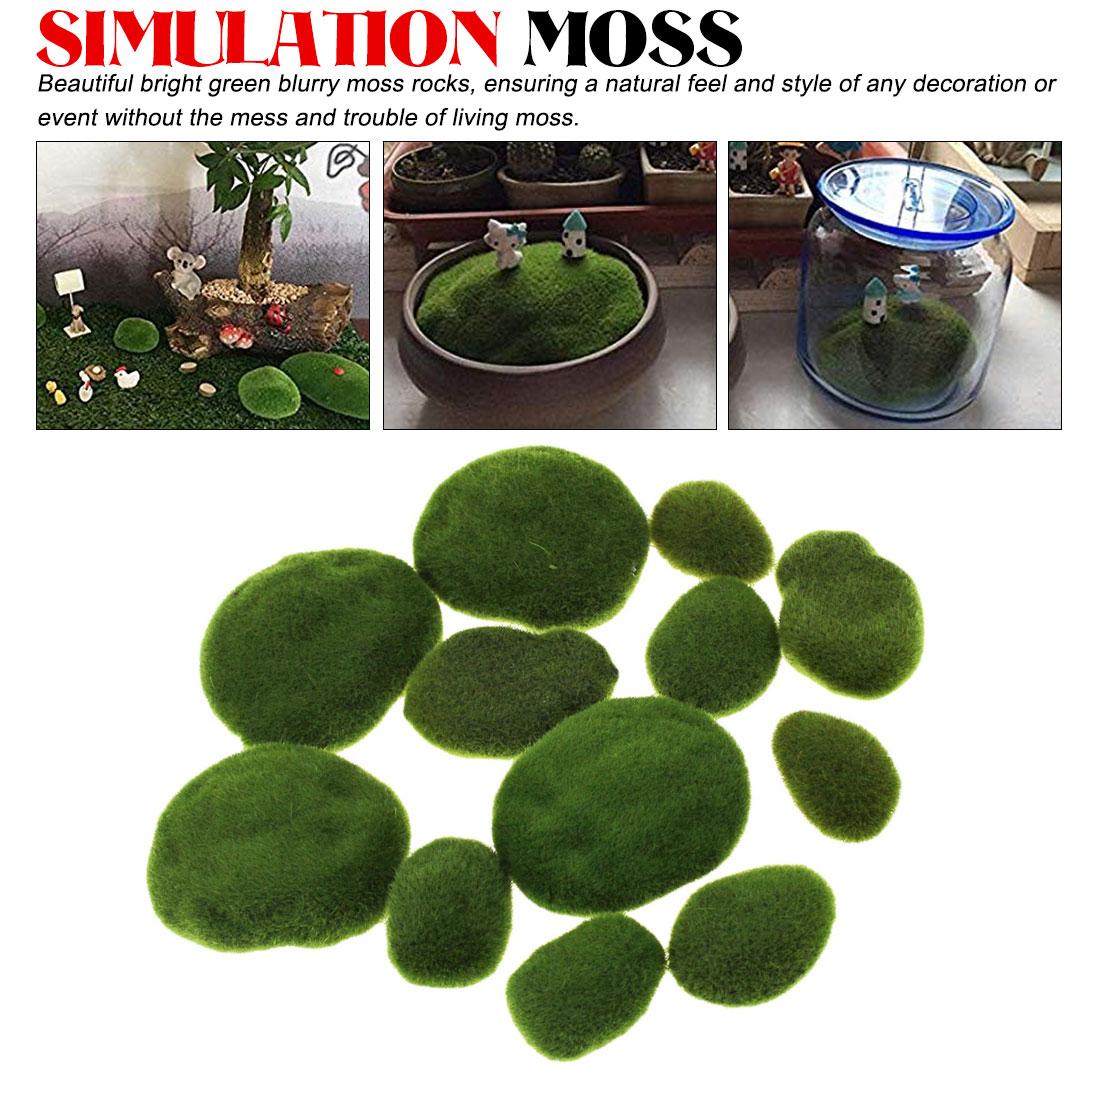 1pcs Simulation Moss Irregular Green Stones Grass Aquarium Garden Plant DIY Micro Landscape Decorations